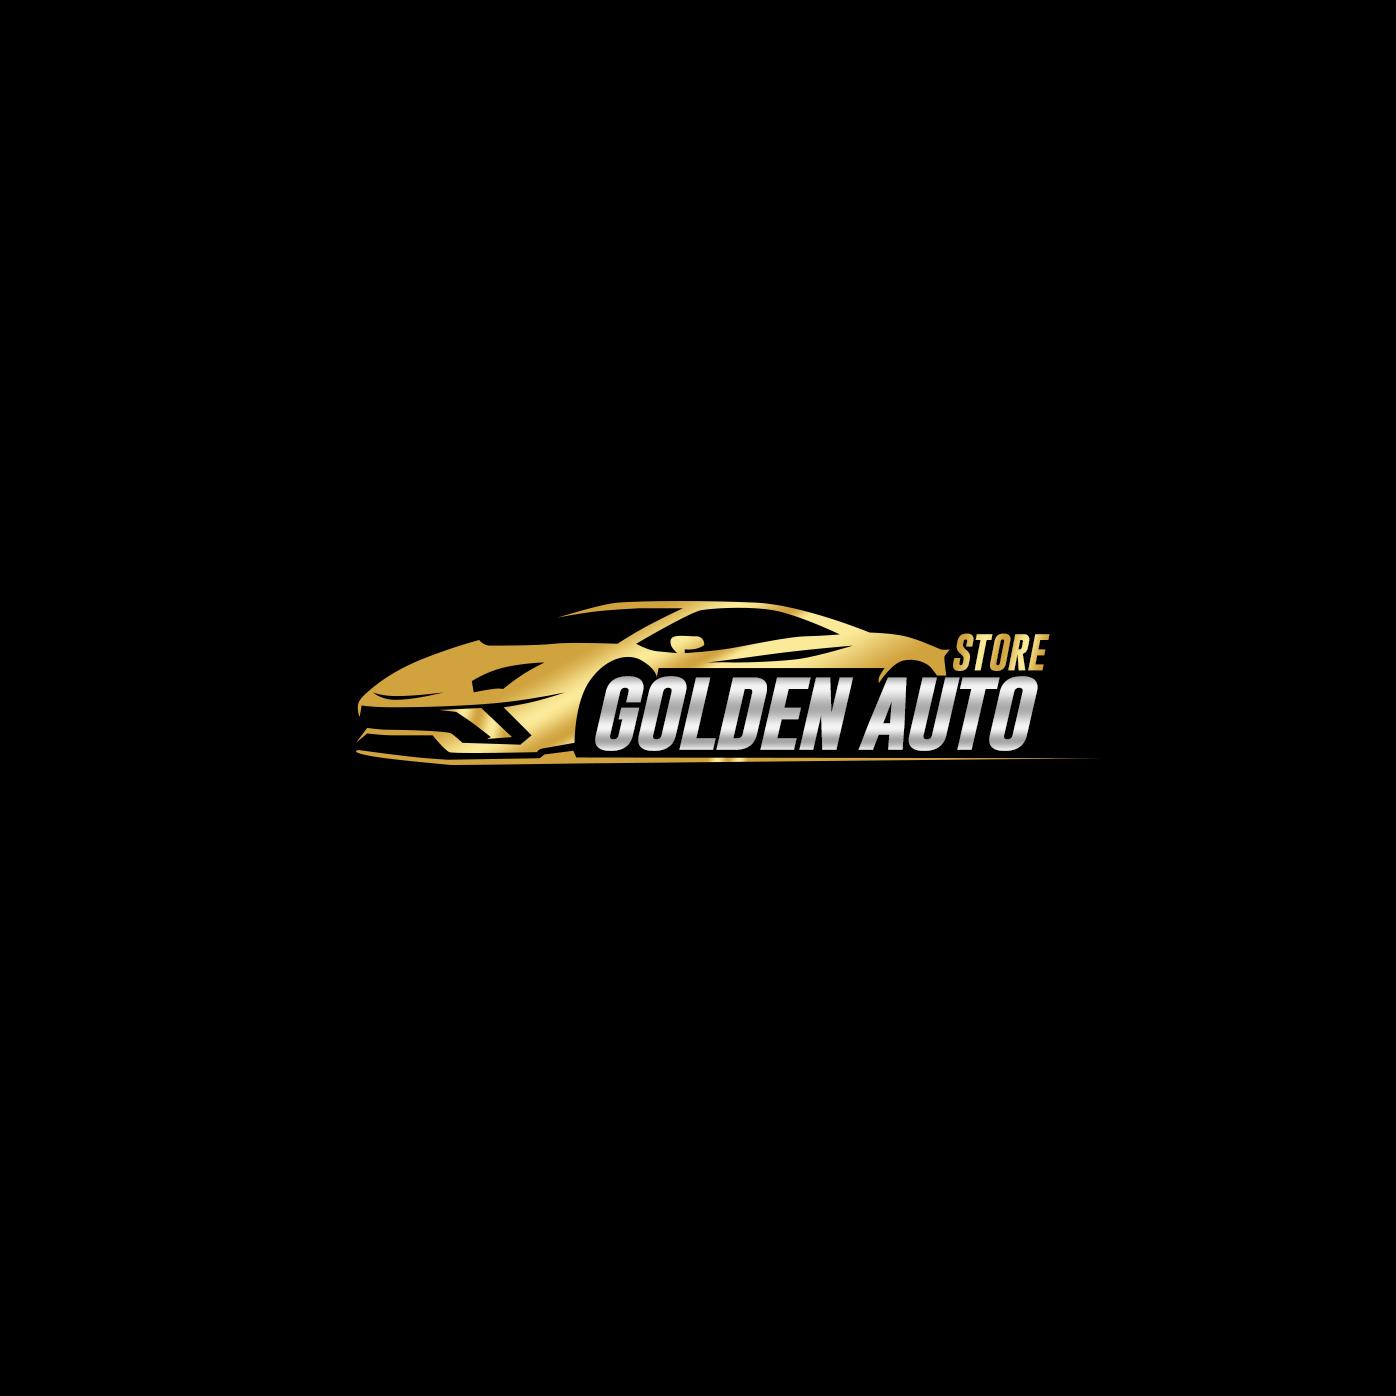 Car Dealer Logo Design For Golden Auto